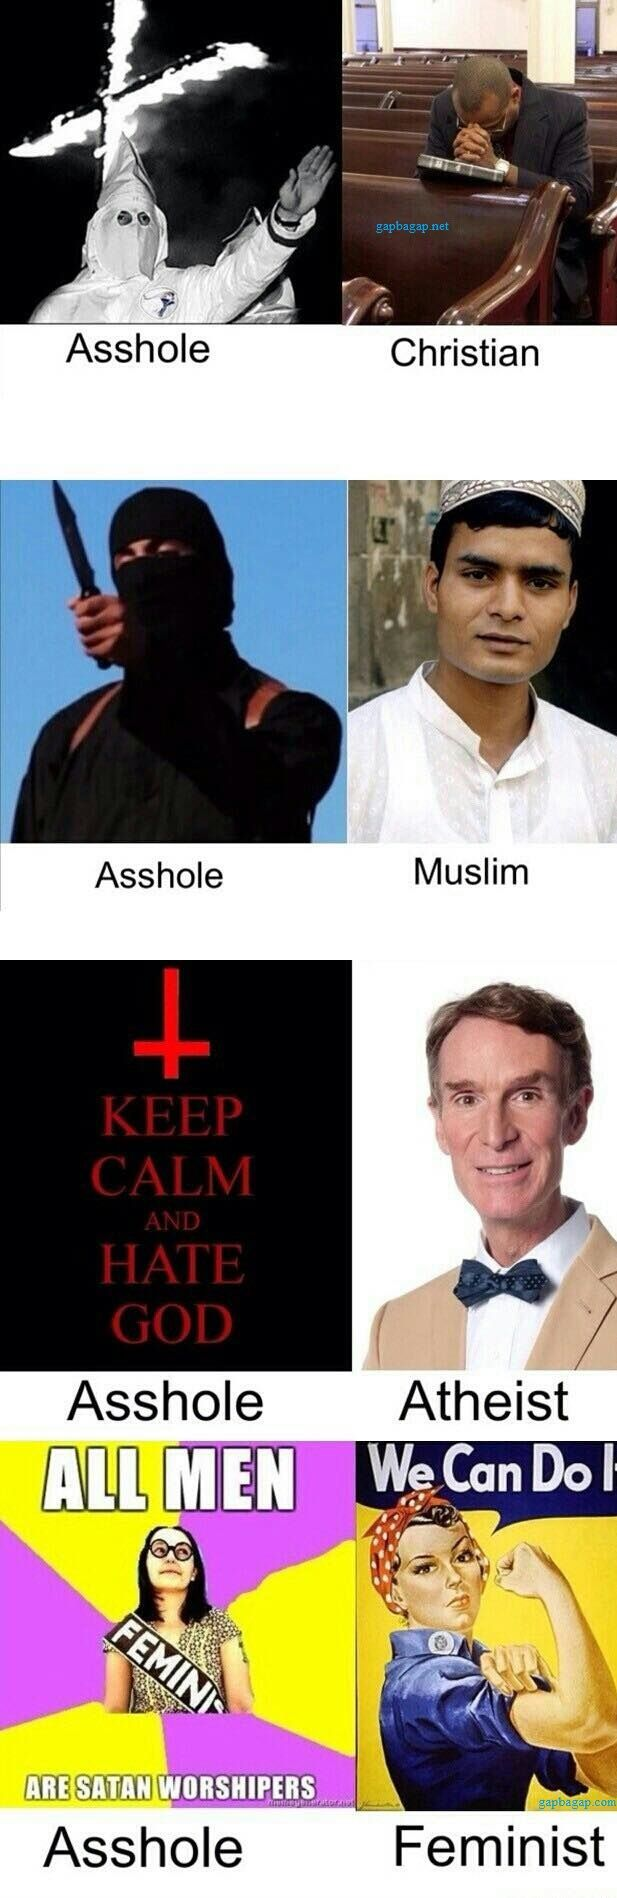 Funny Memes About Religions vs. Assholes